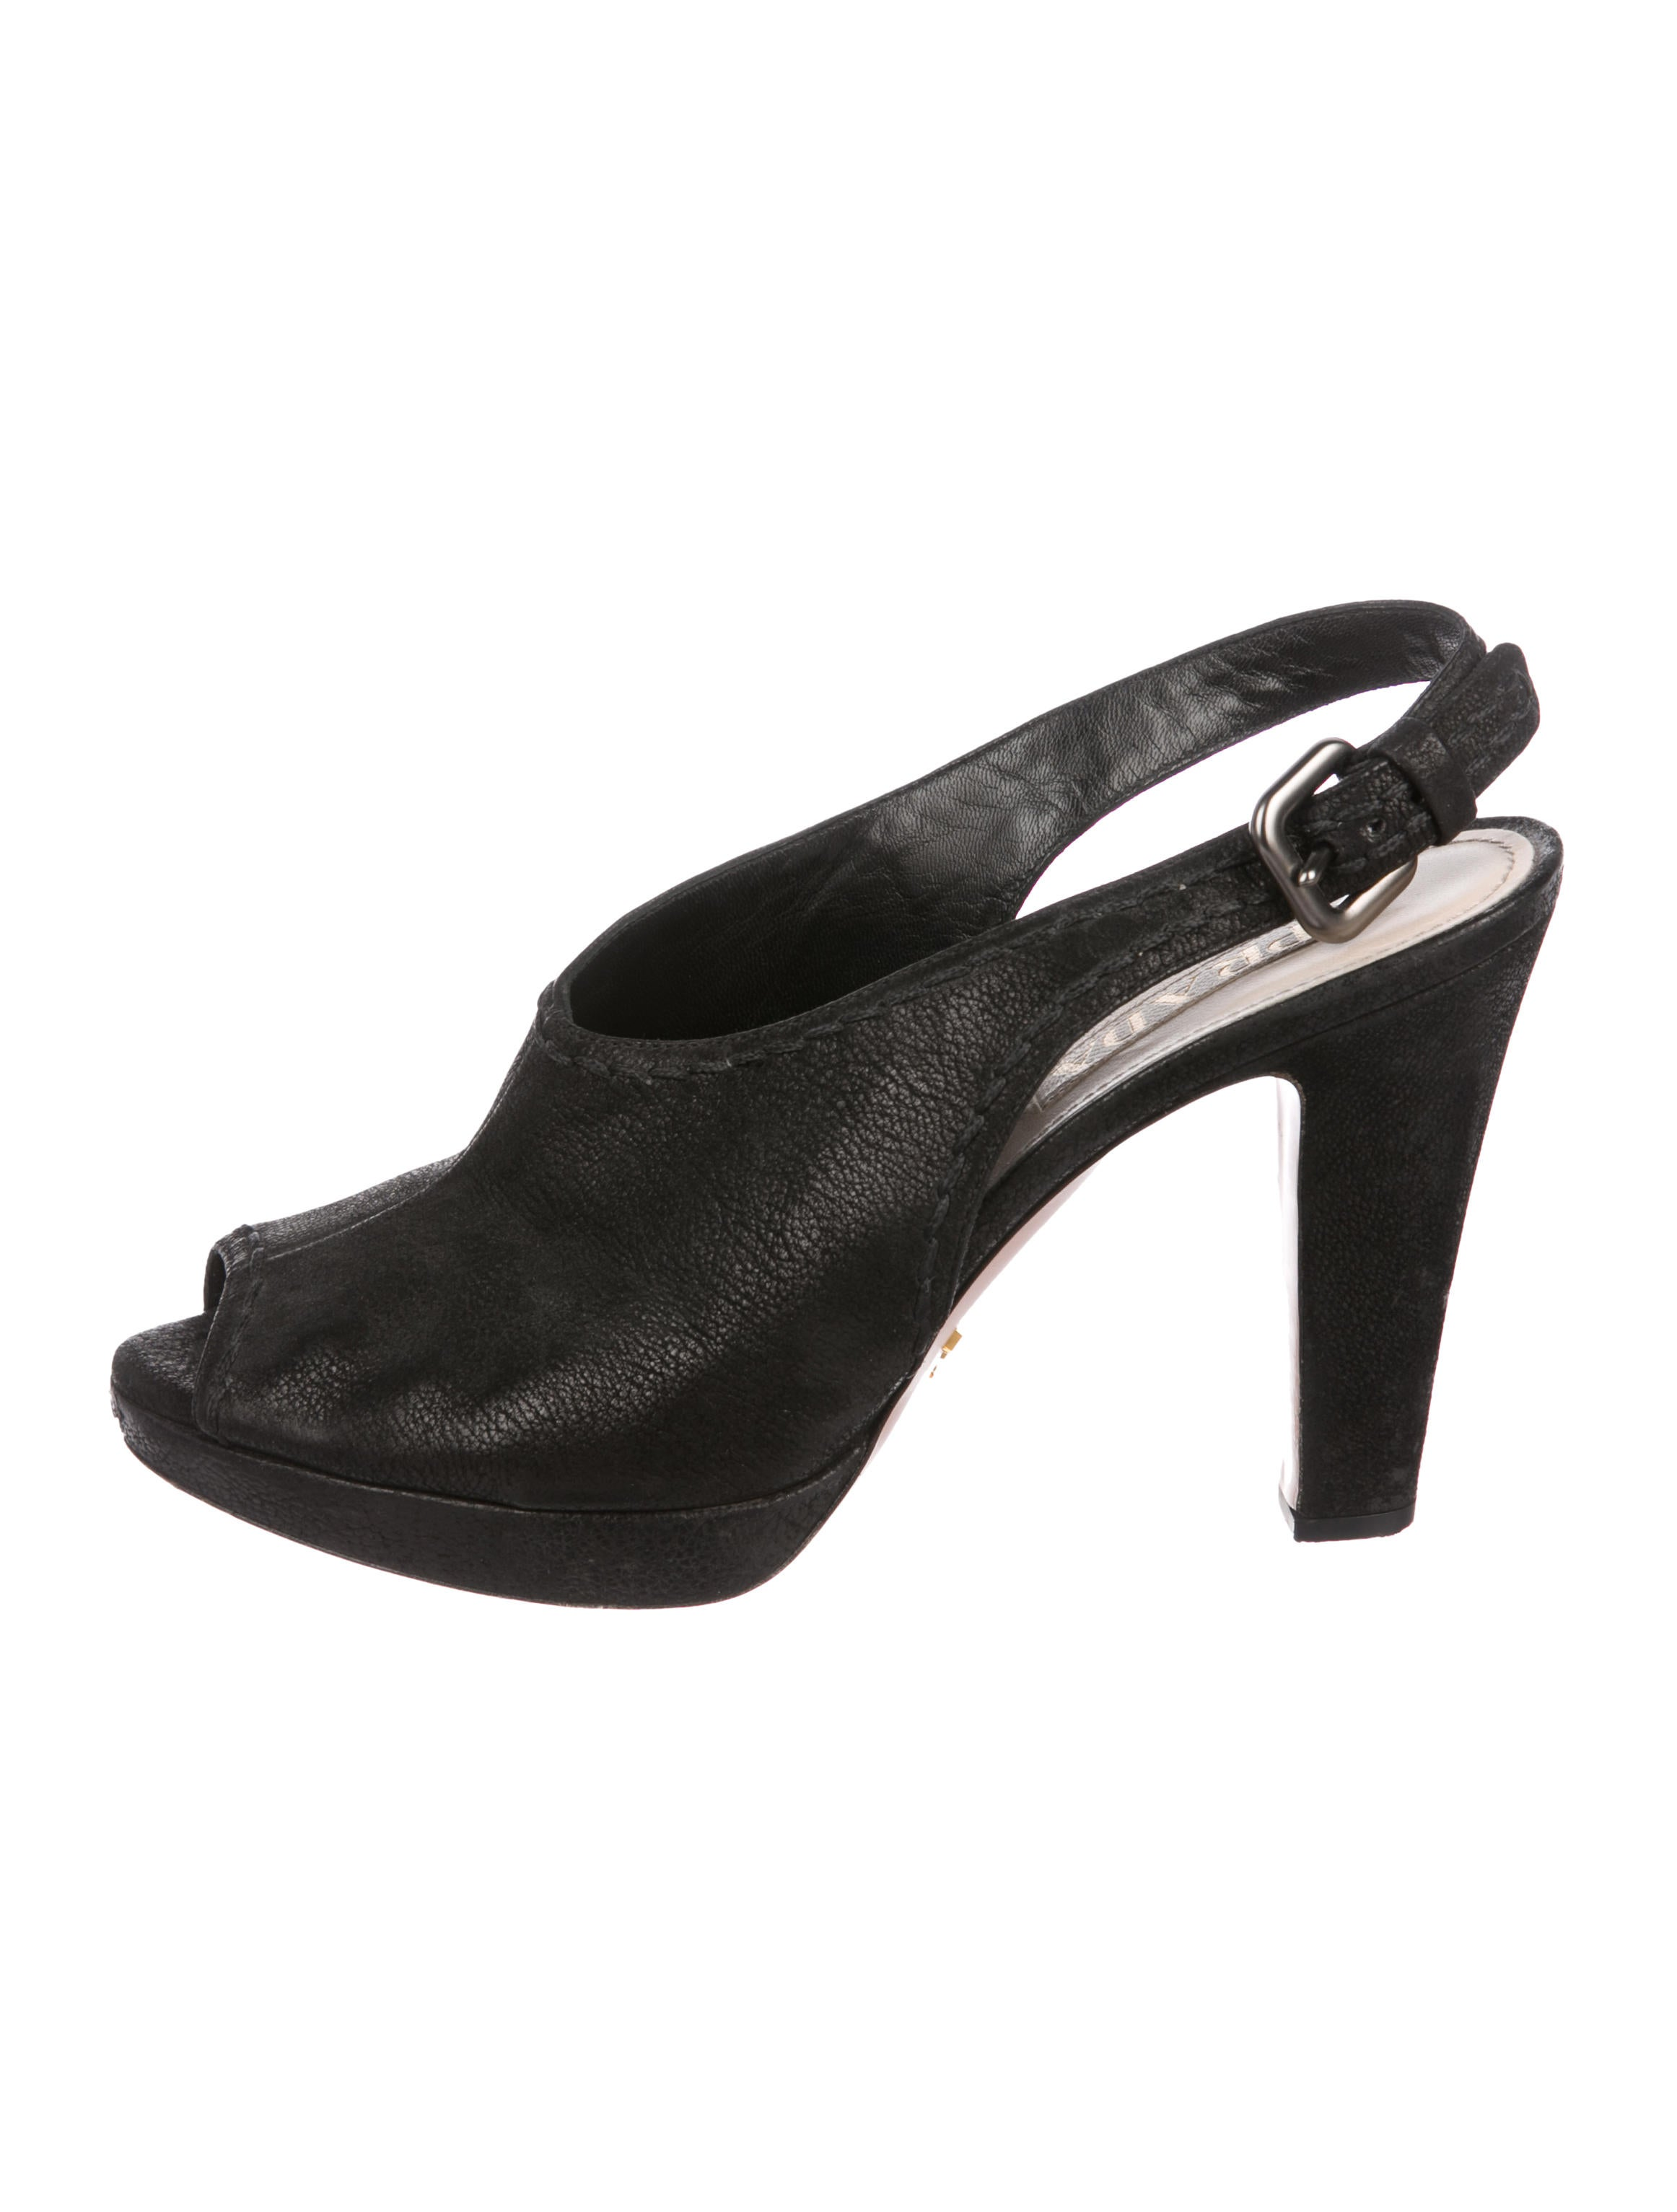 377a63343ae Prada Leather Peep-Toe Slingback Pumps - Shoes - PRA268503